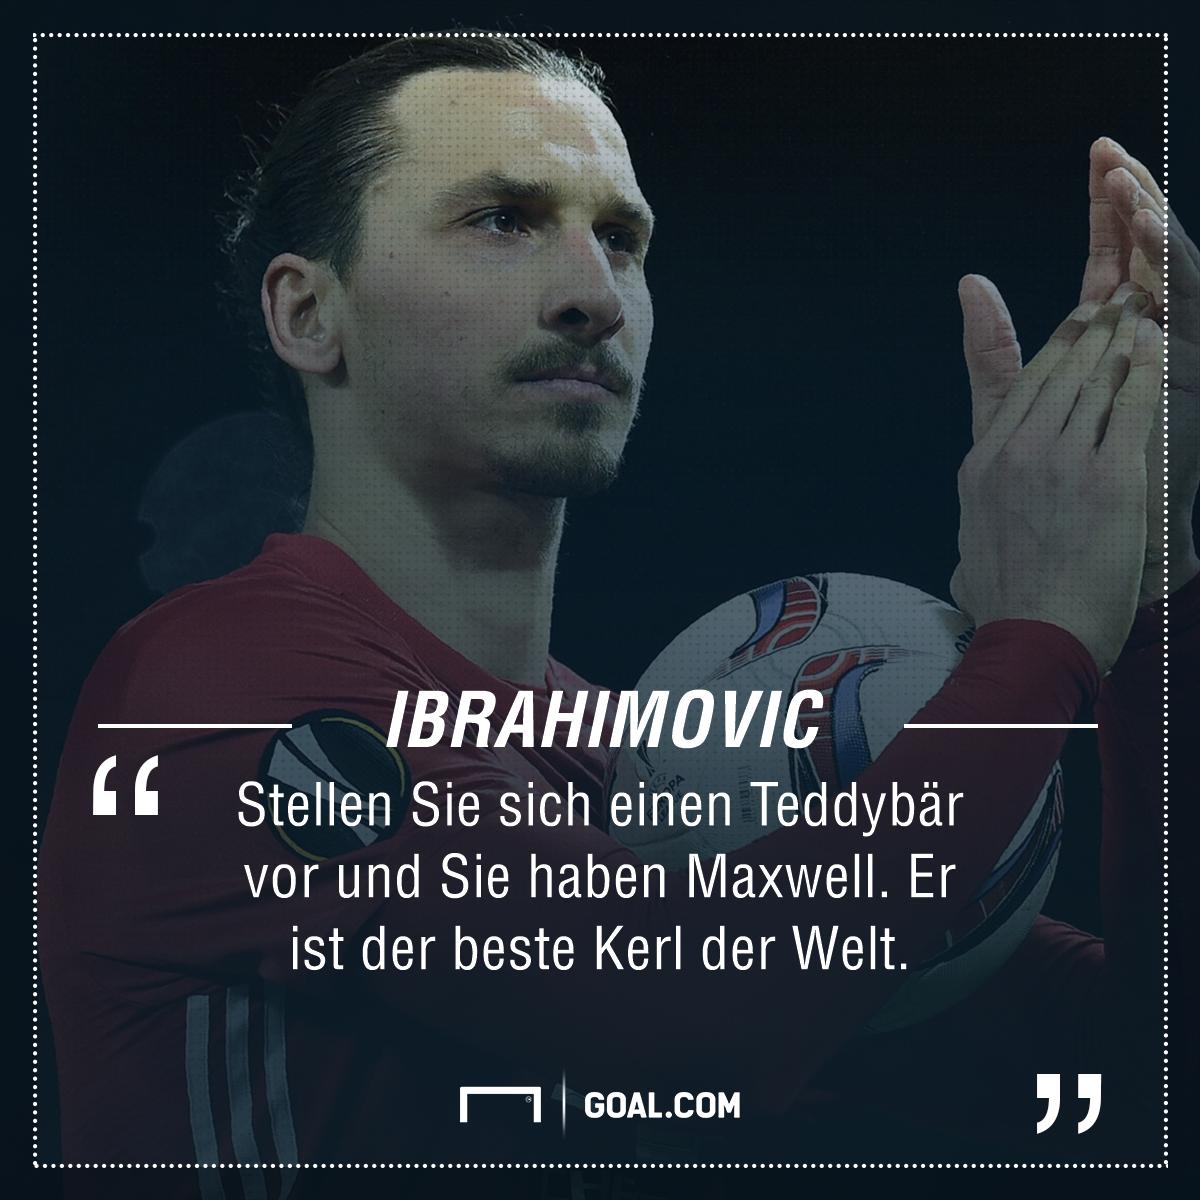 Ibrahimovic Quote 25042017